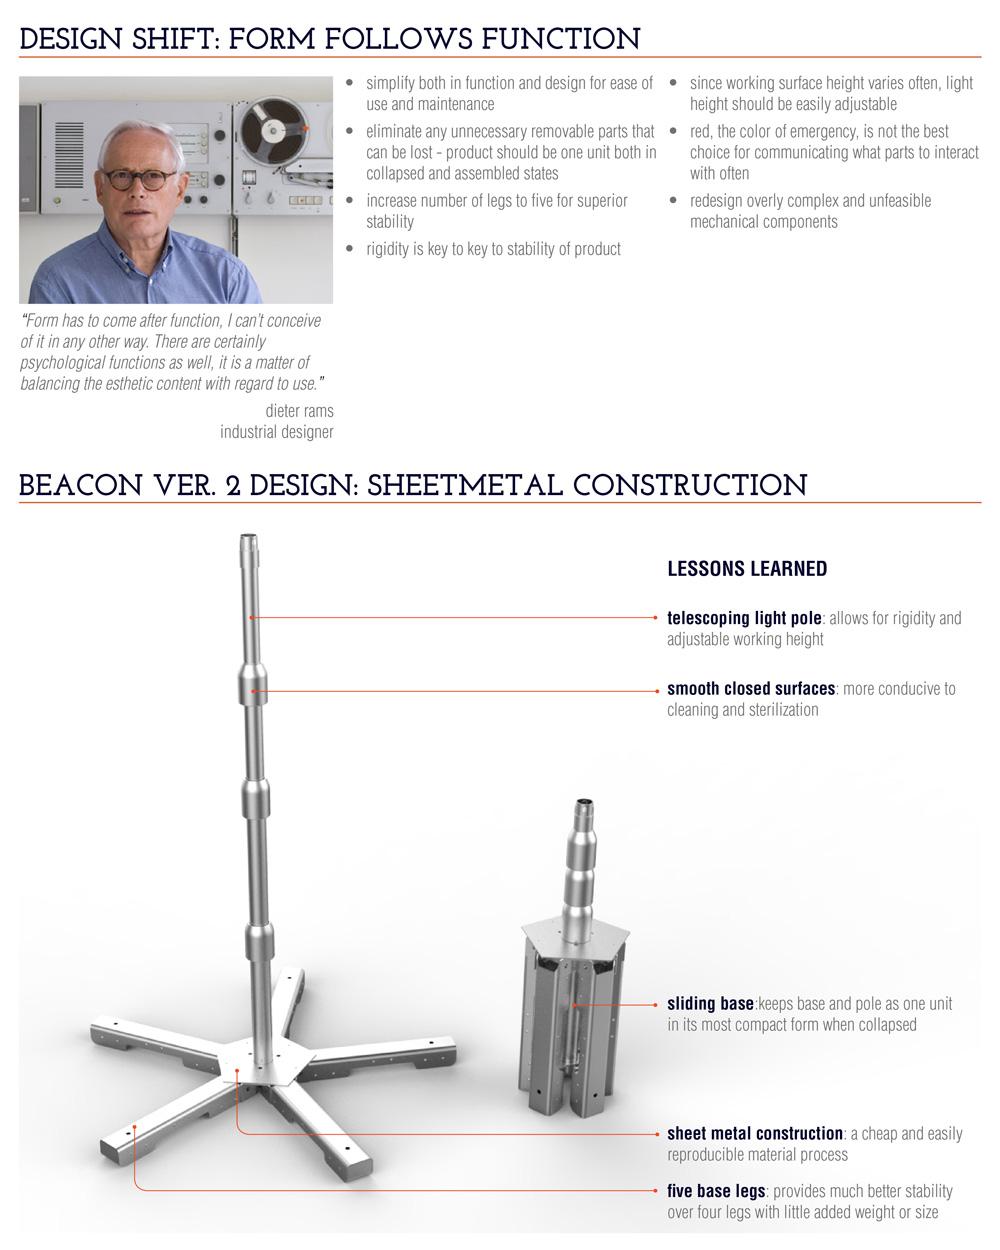 beacon-portfolio-pages8.jpg